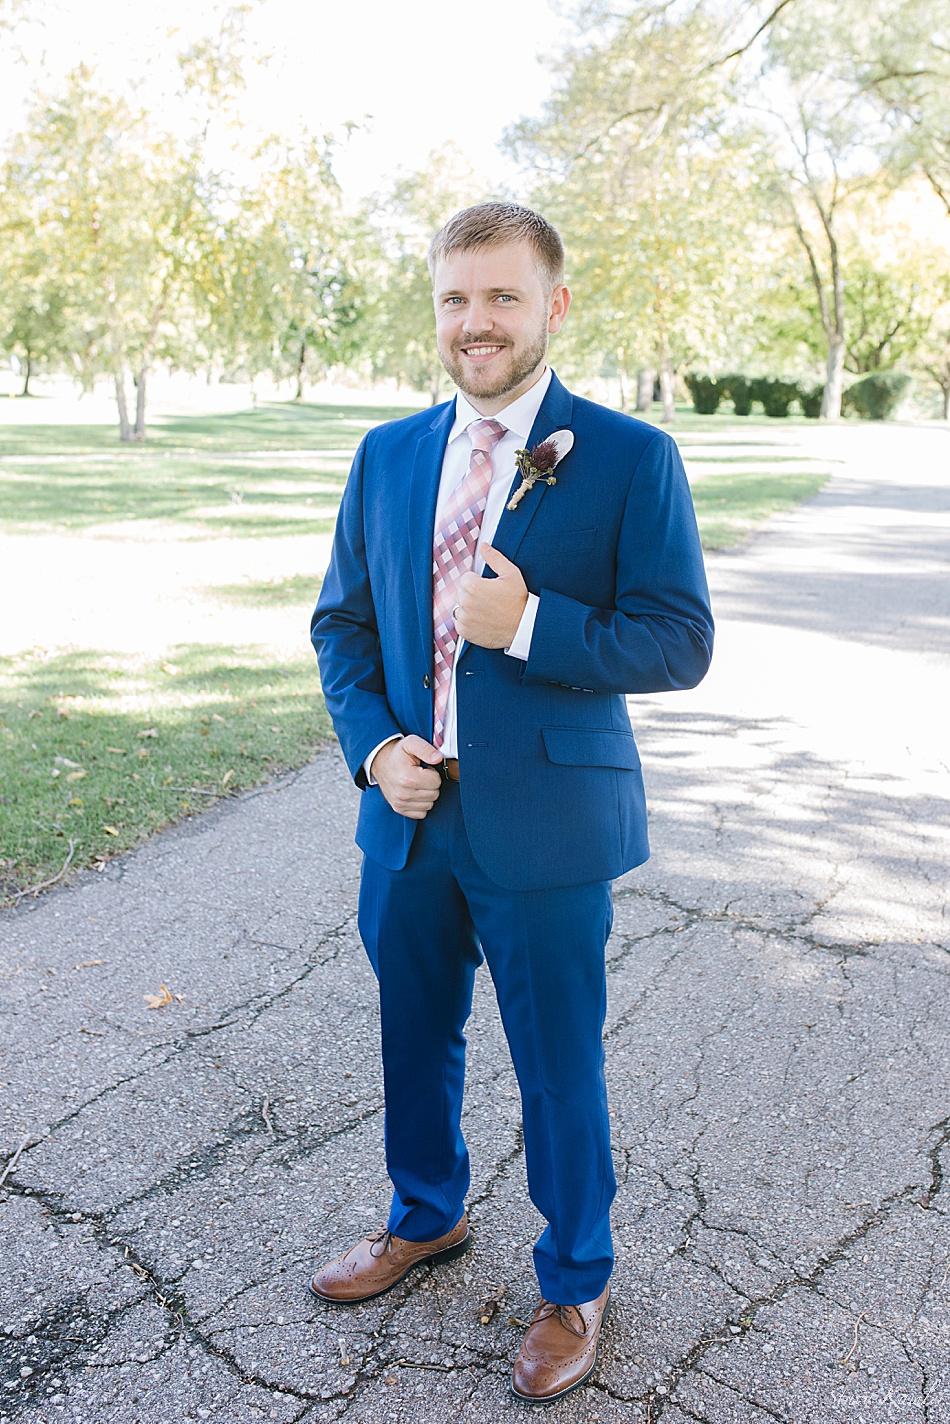 Groom in navy blue suit